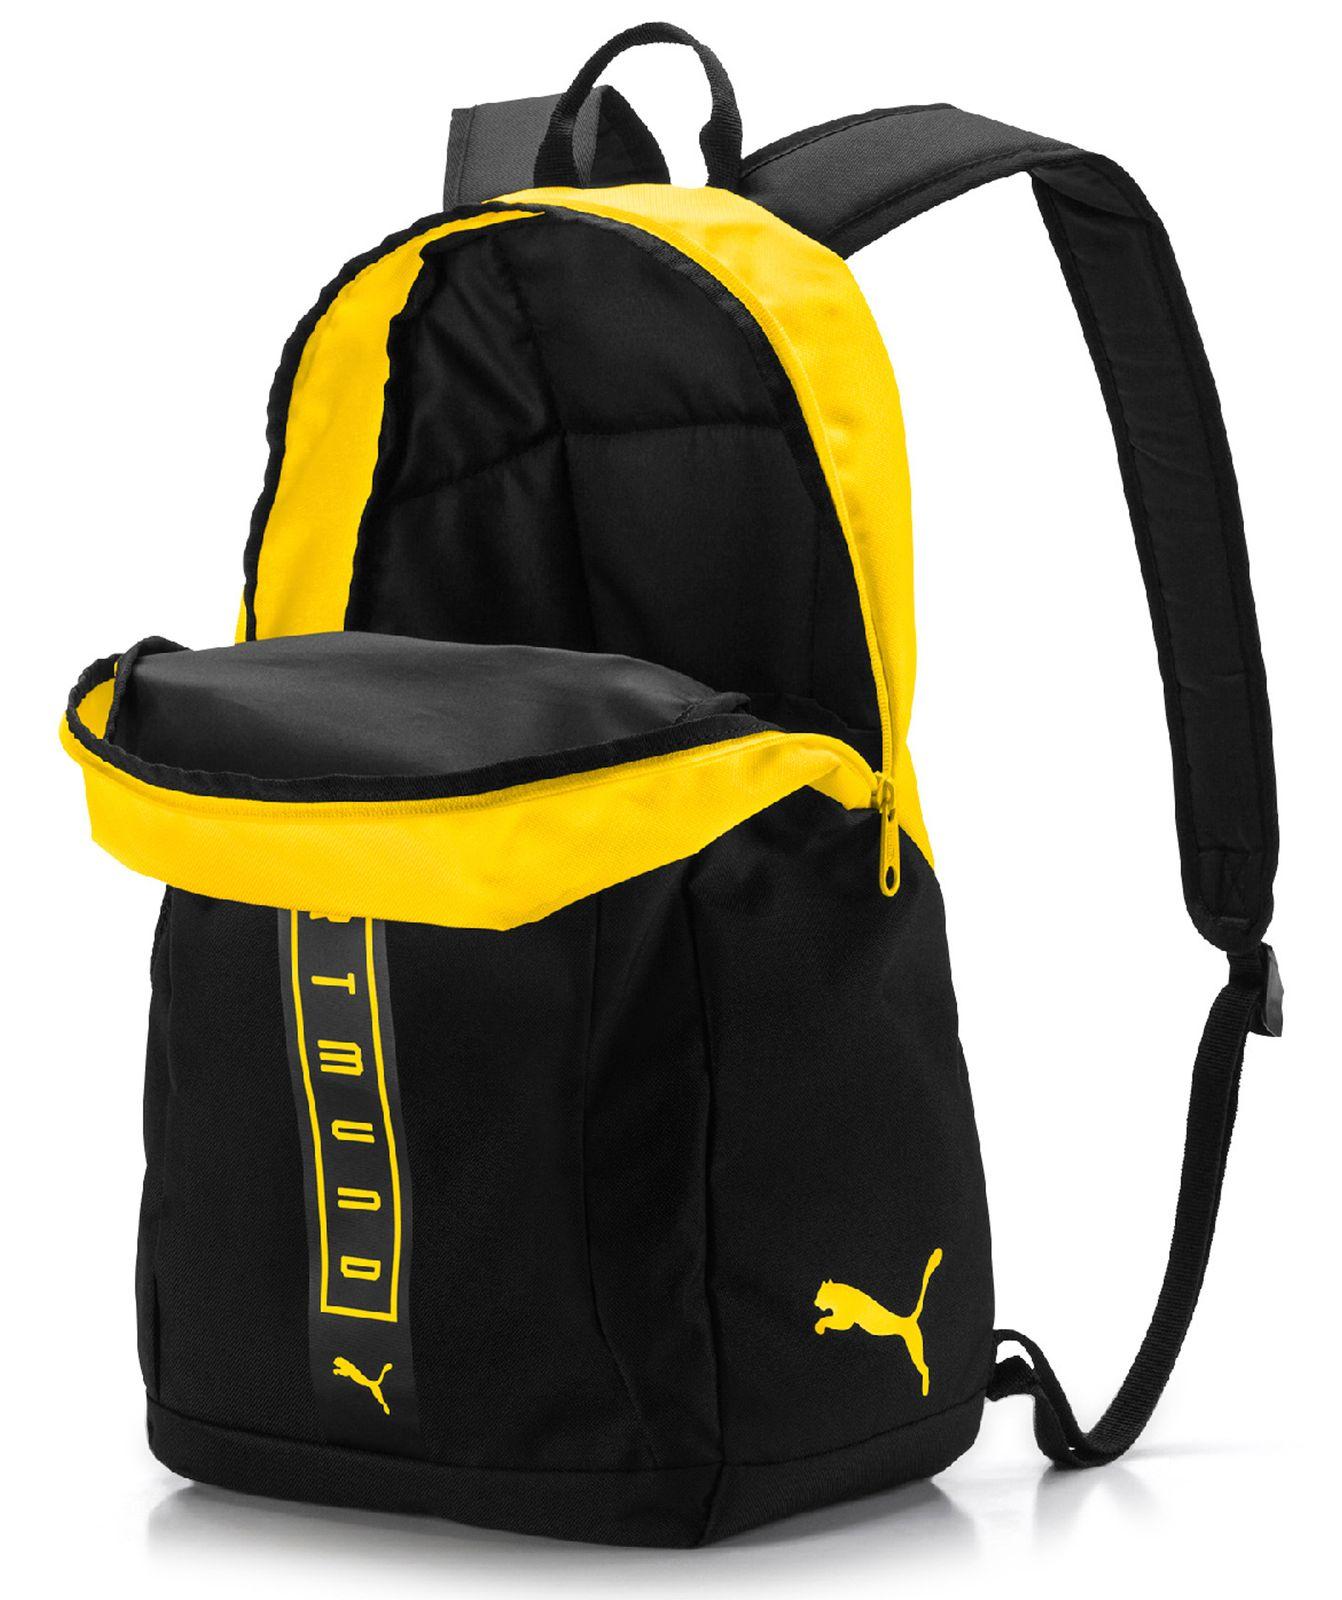 eca3a87d6118d PUMA BVB Fan Backpack Puma Black-Cyber Yellow 4060979166103